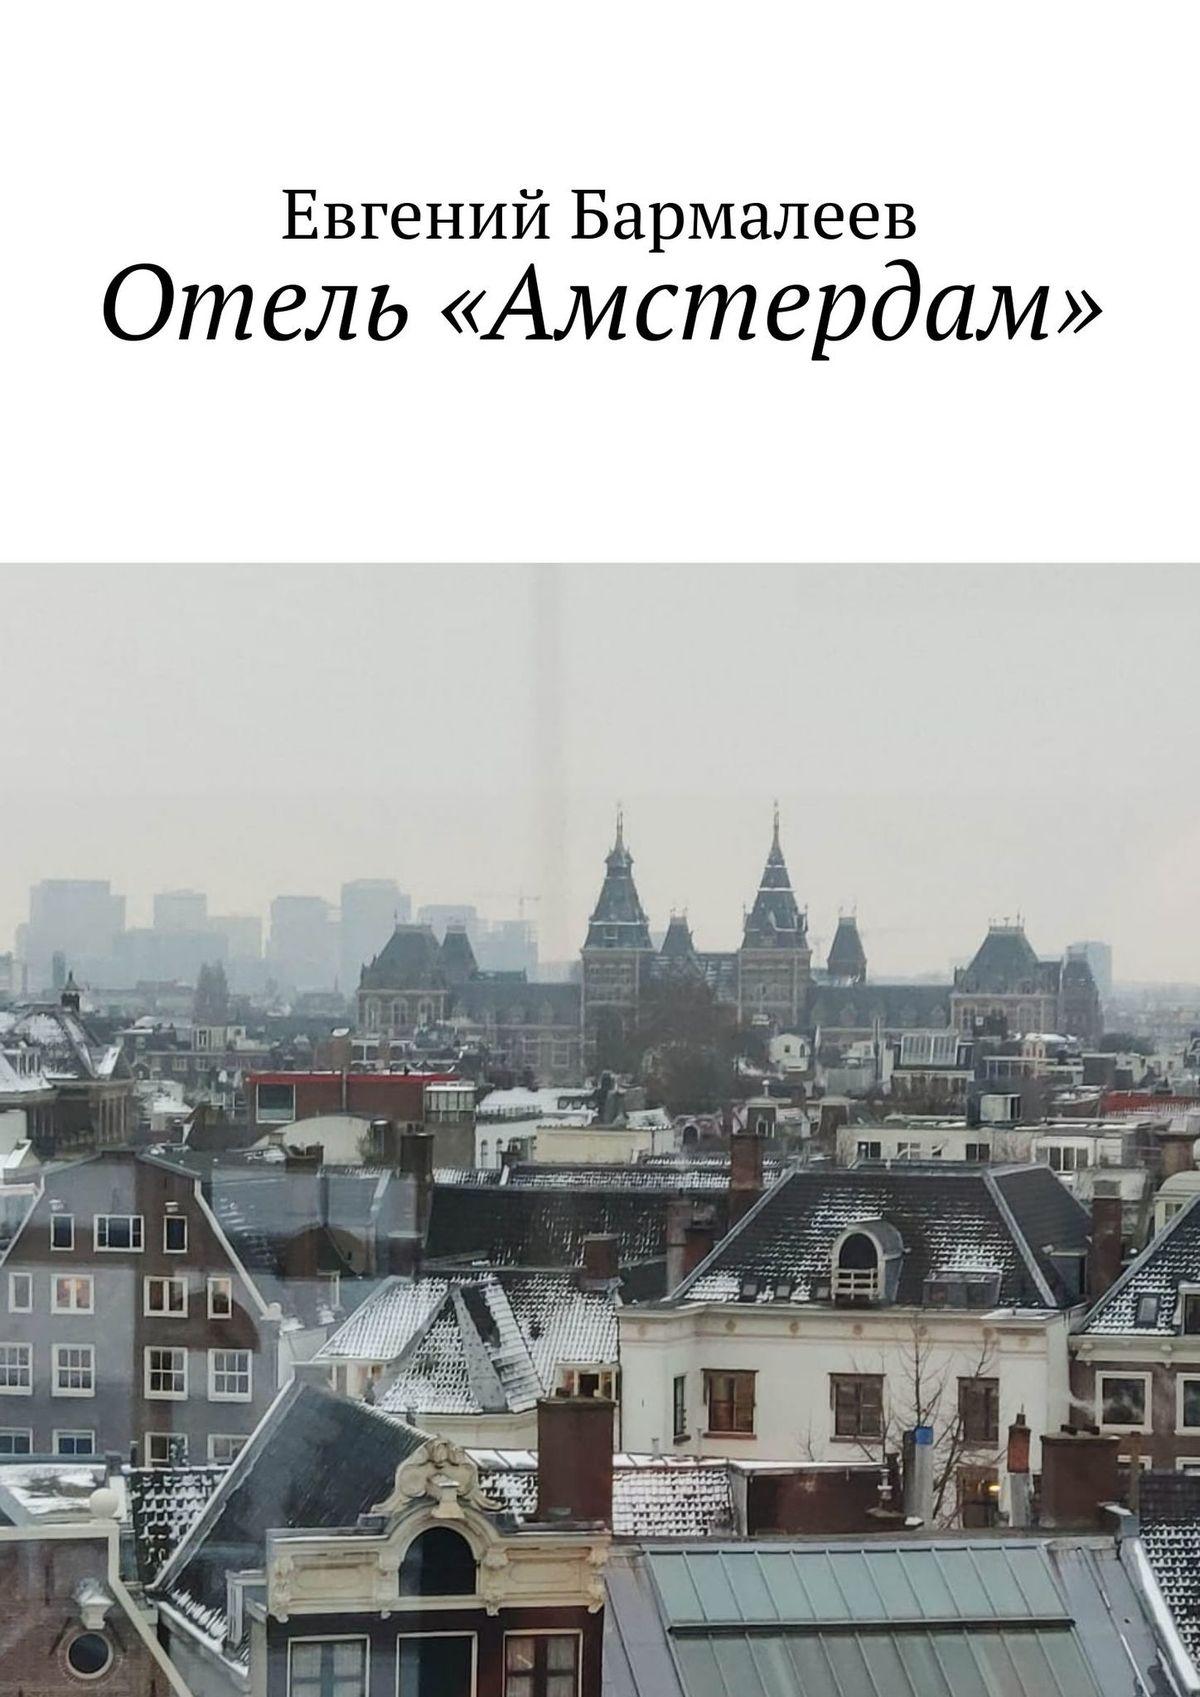 Евгений Бармалеев Отель «Амстердам»